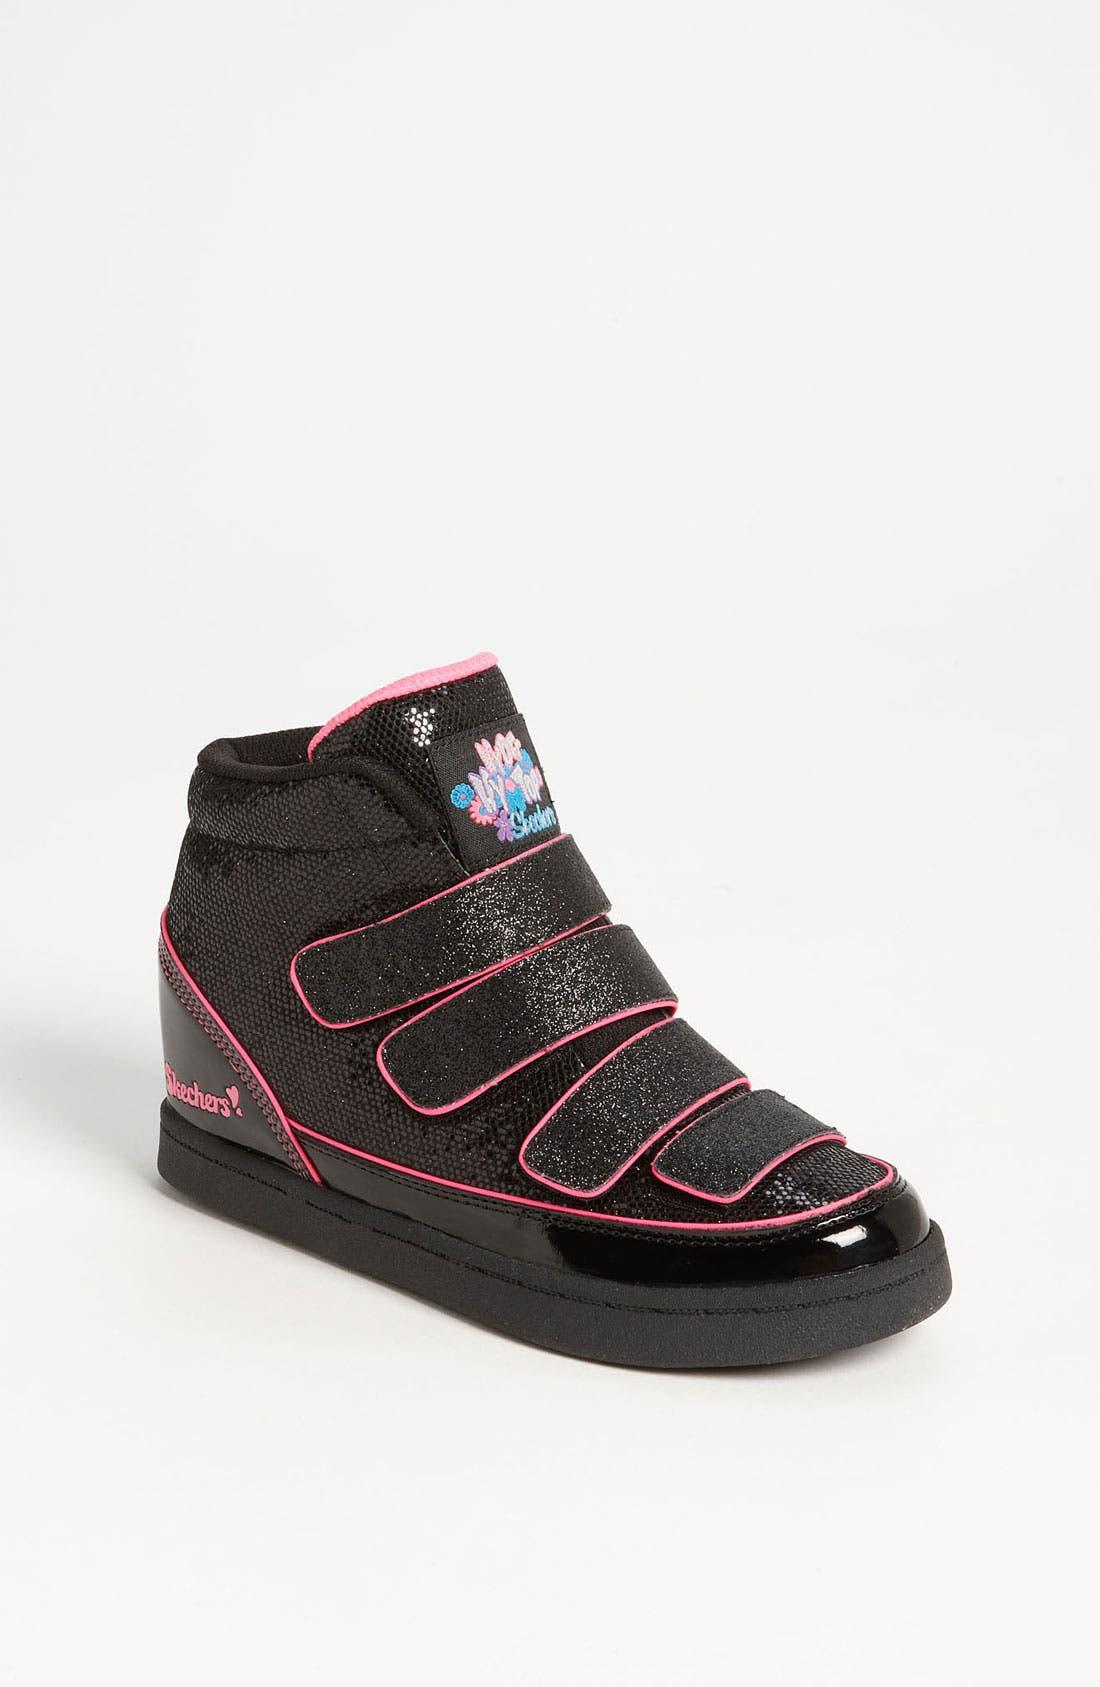 Alternate Image 1 Selected - SKECHERS '4 Upz' Sneaker (Toddler, Little Kid & Big Kid)